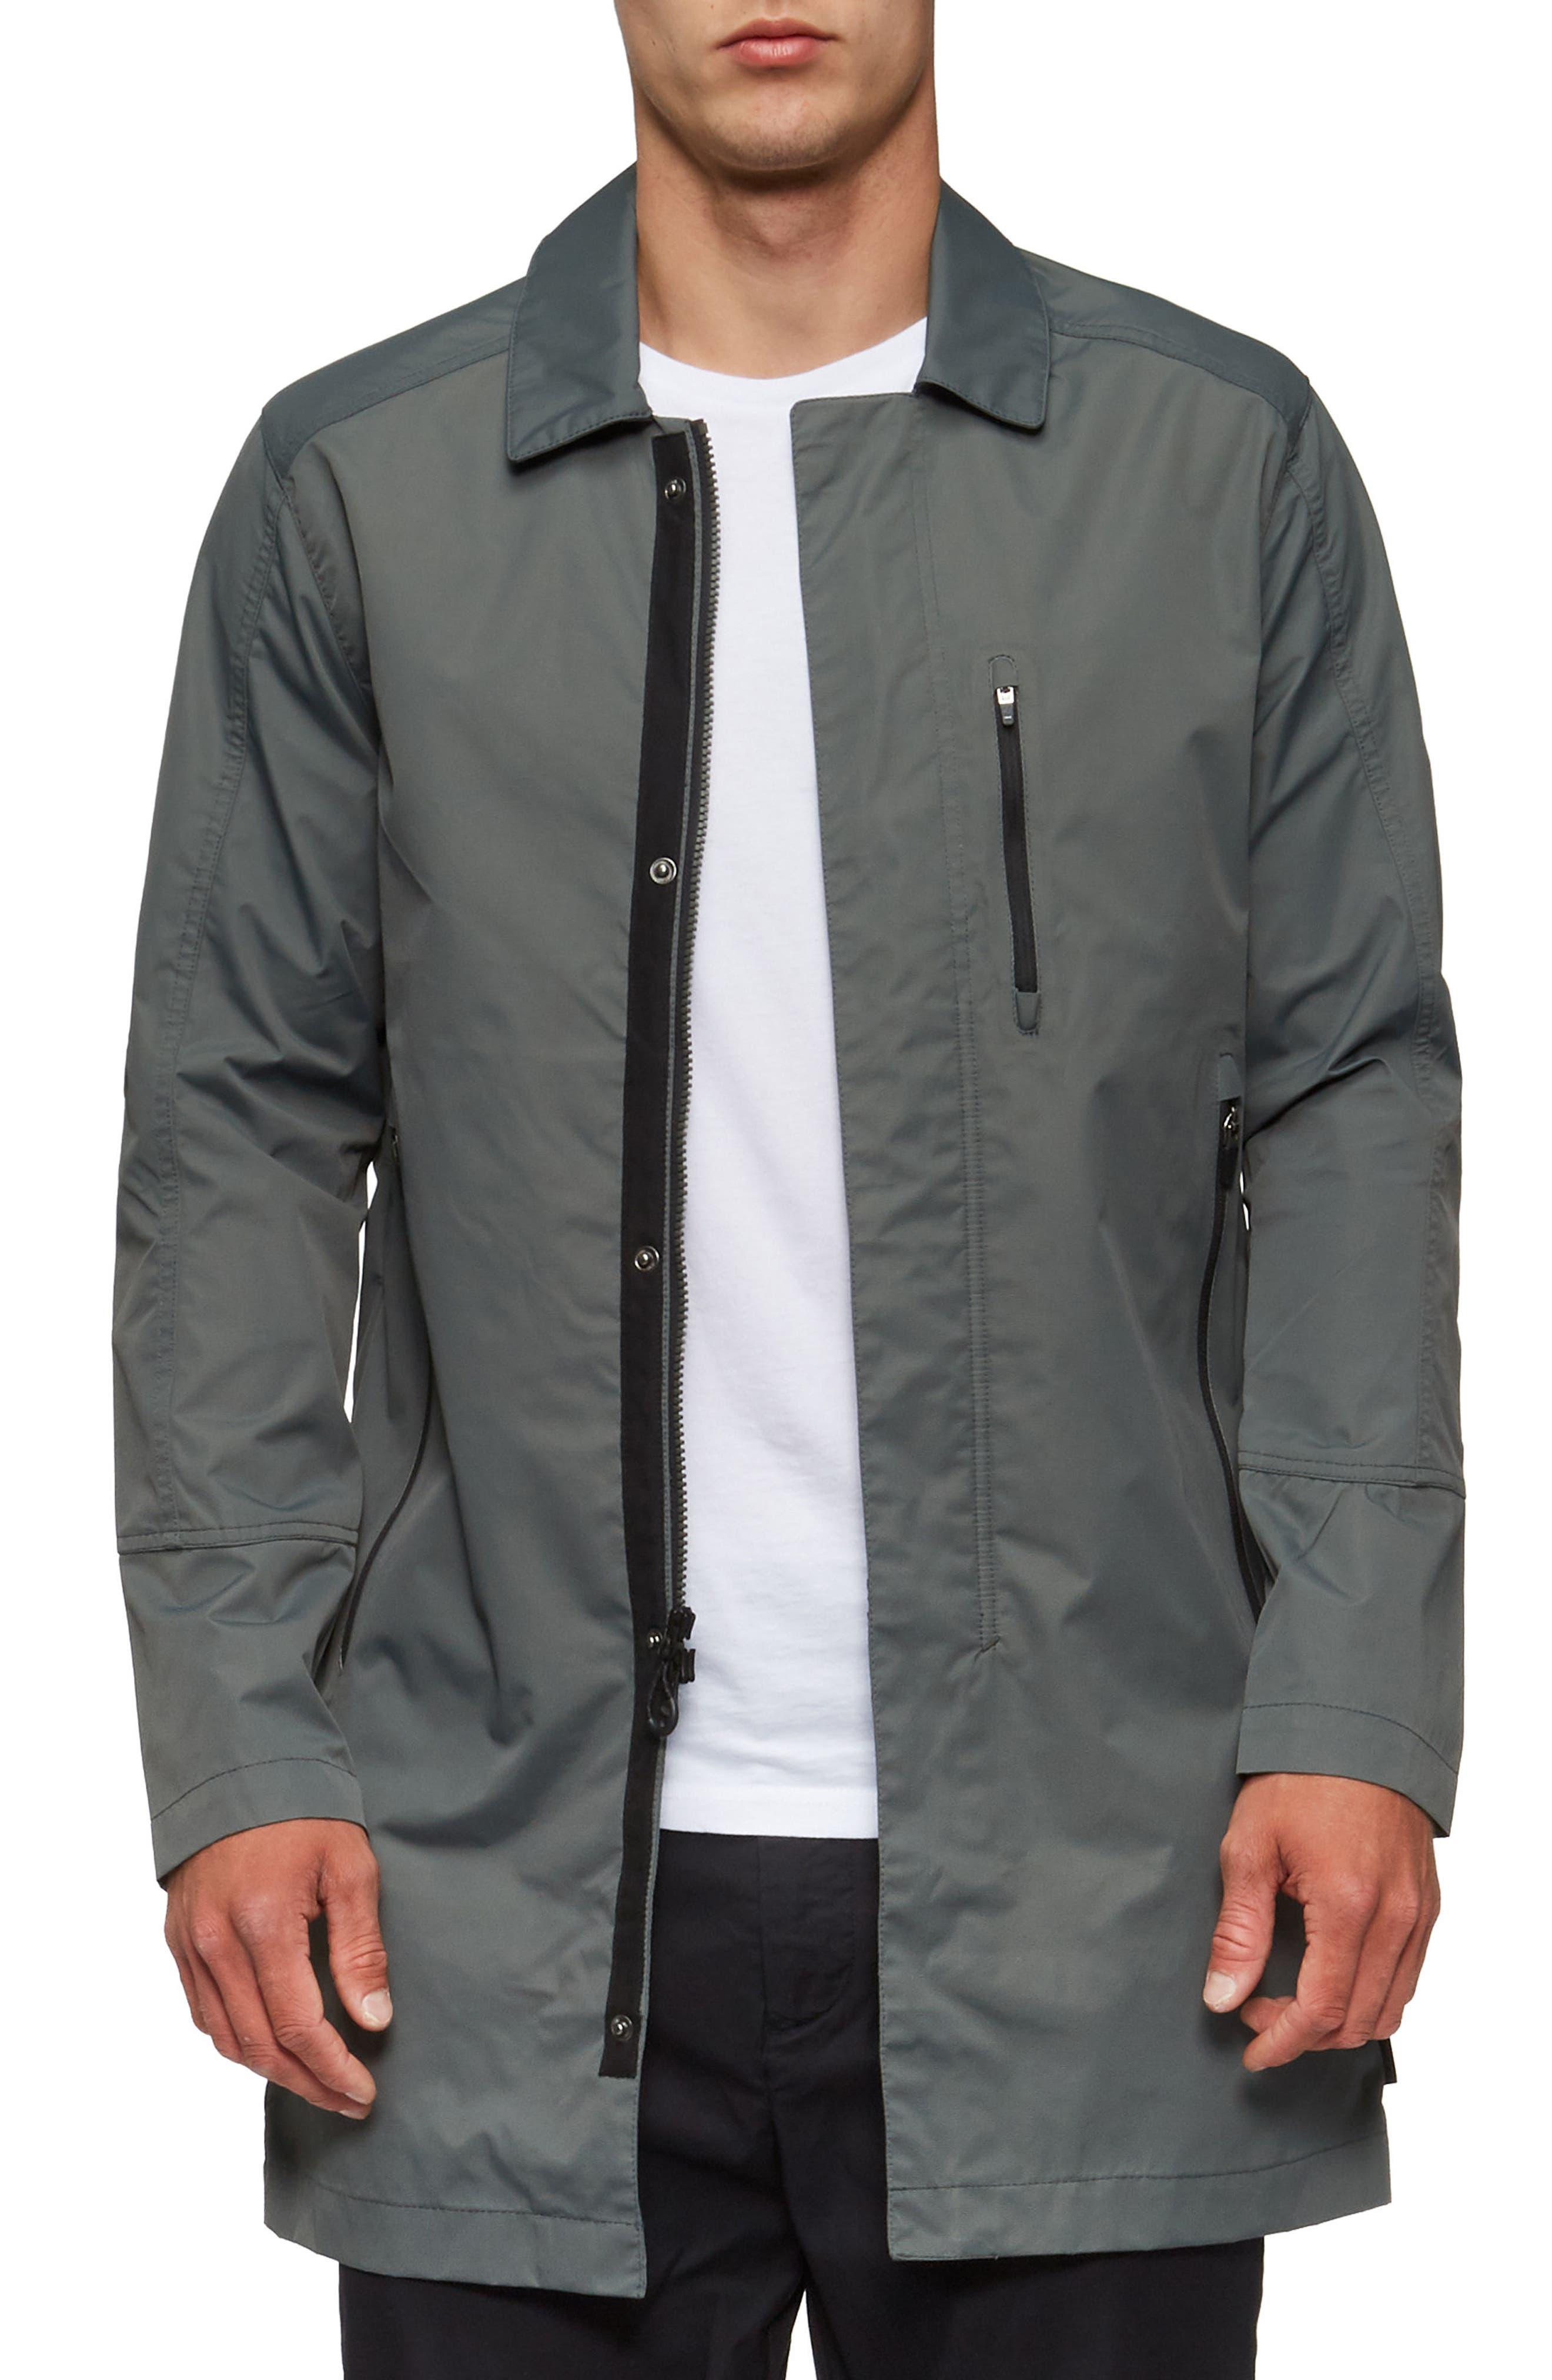 Deckard Weather Resistant Trench Coat,                             Alternate thumbnail 4, color,                             Surplus Green